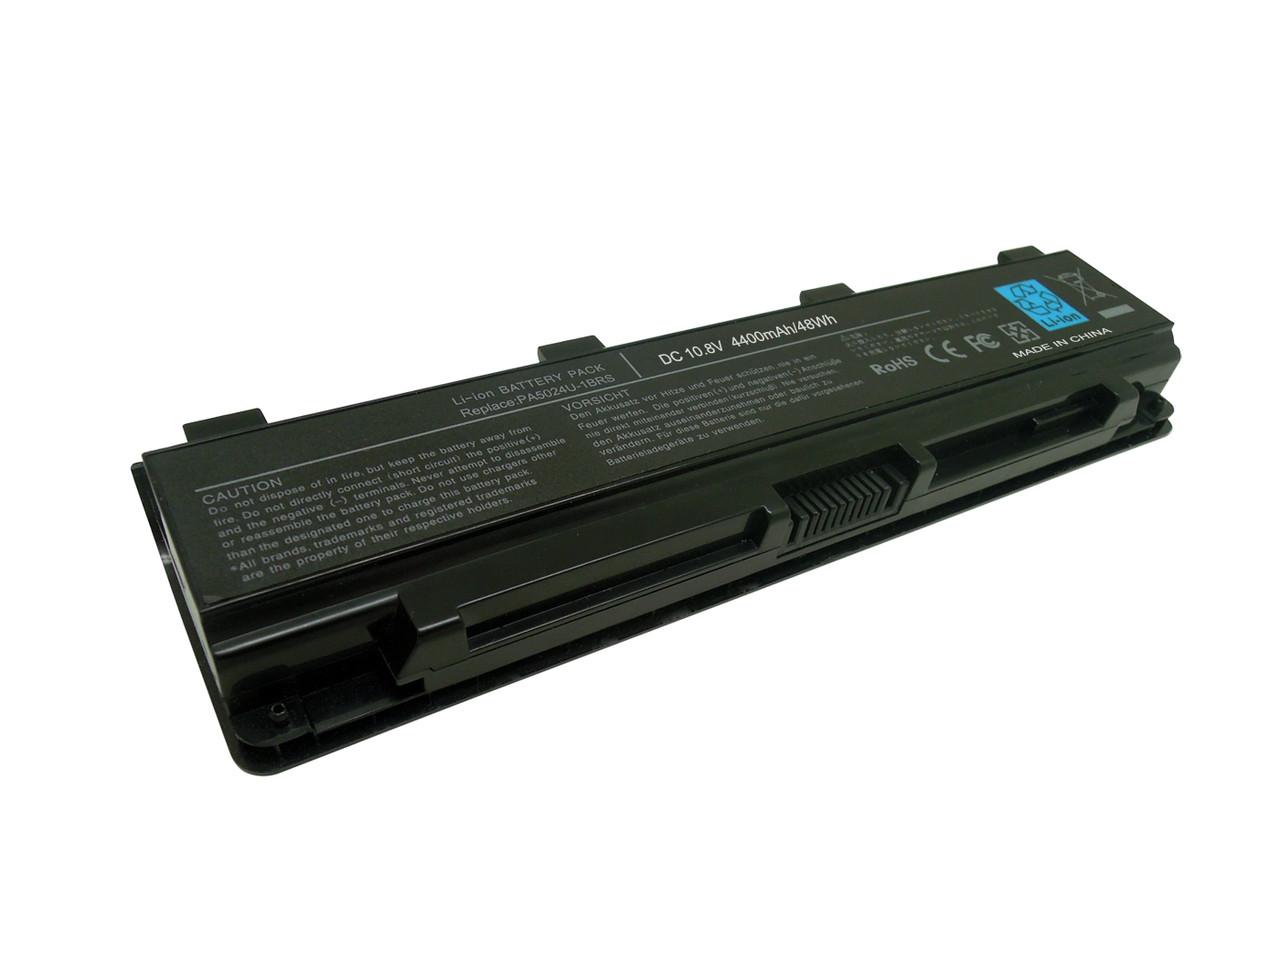 Аккумулятор для ноутбука TOSHIBA SATELLITE S855-S5369